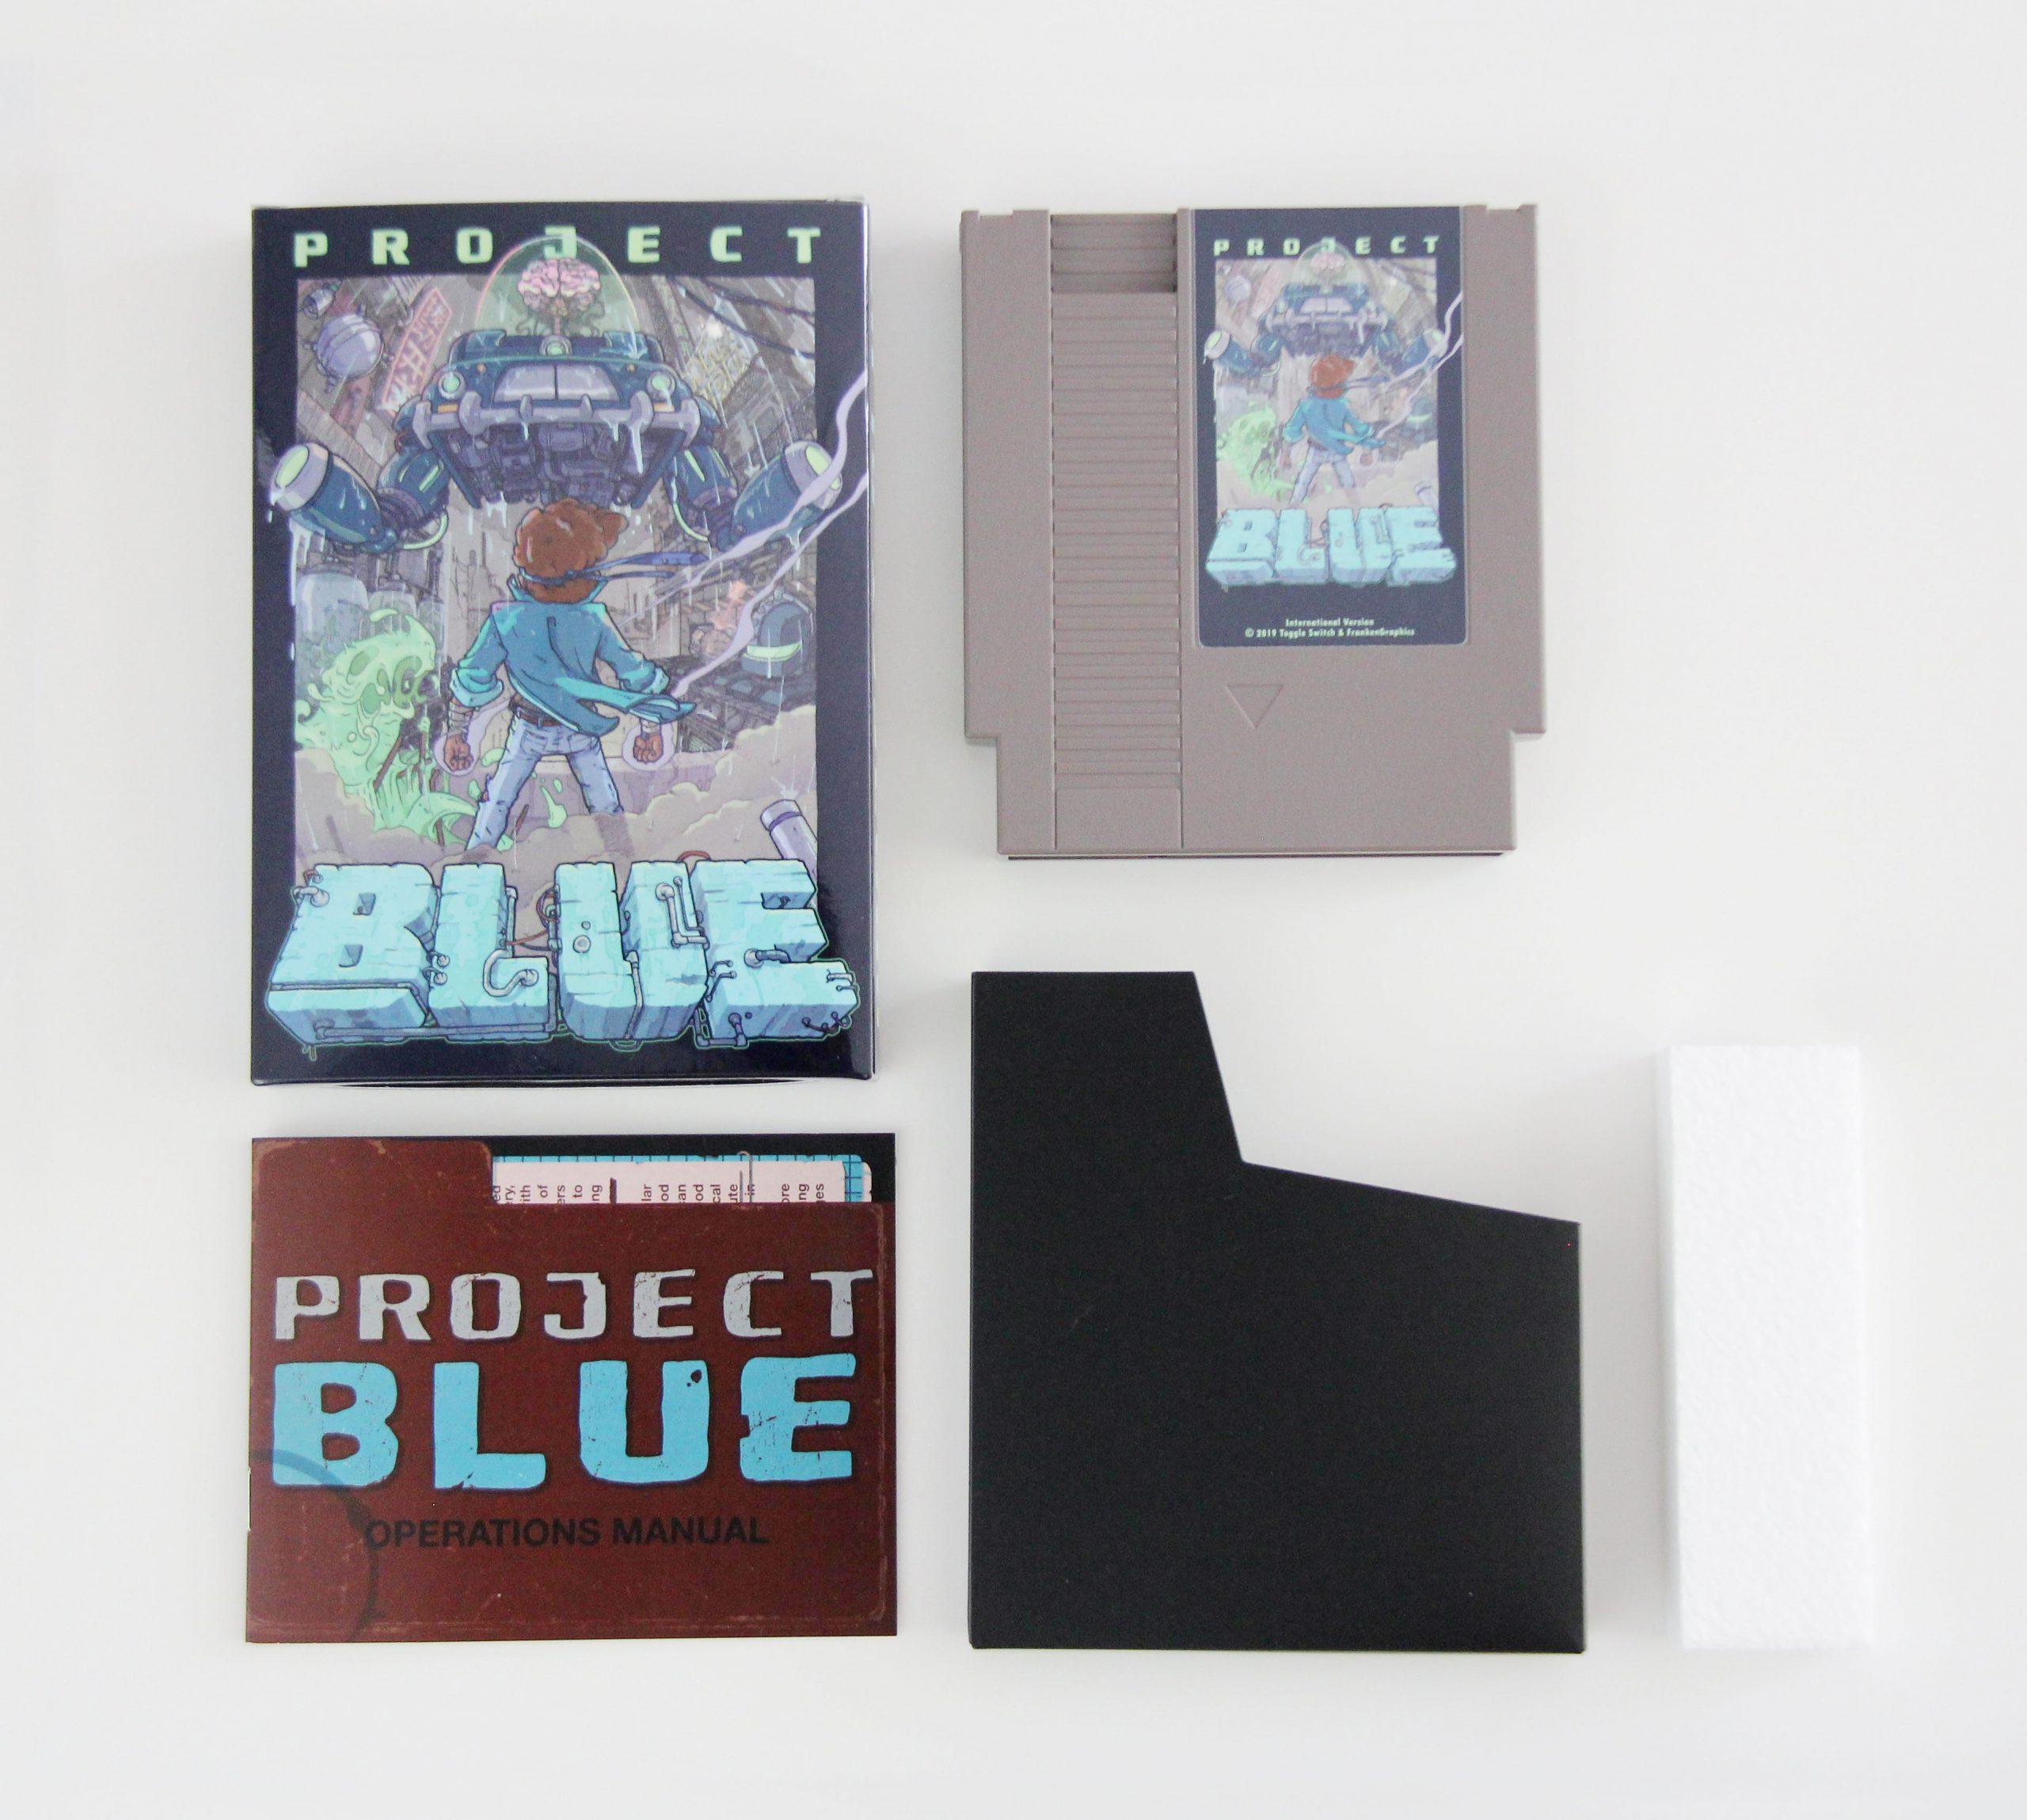 Broke_Studio_Project_Blue_NES_Homebrew_01-scaled.jpg